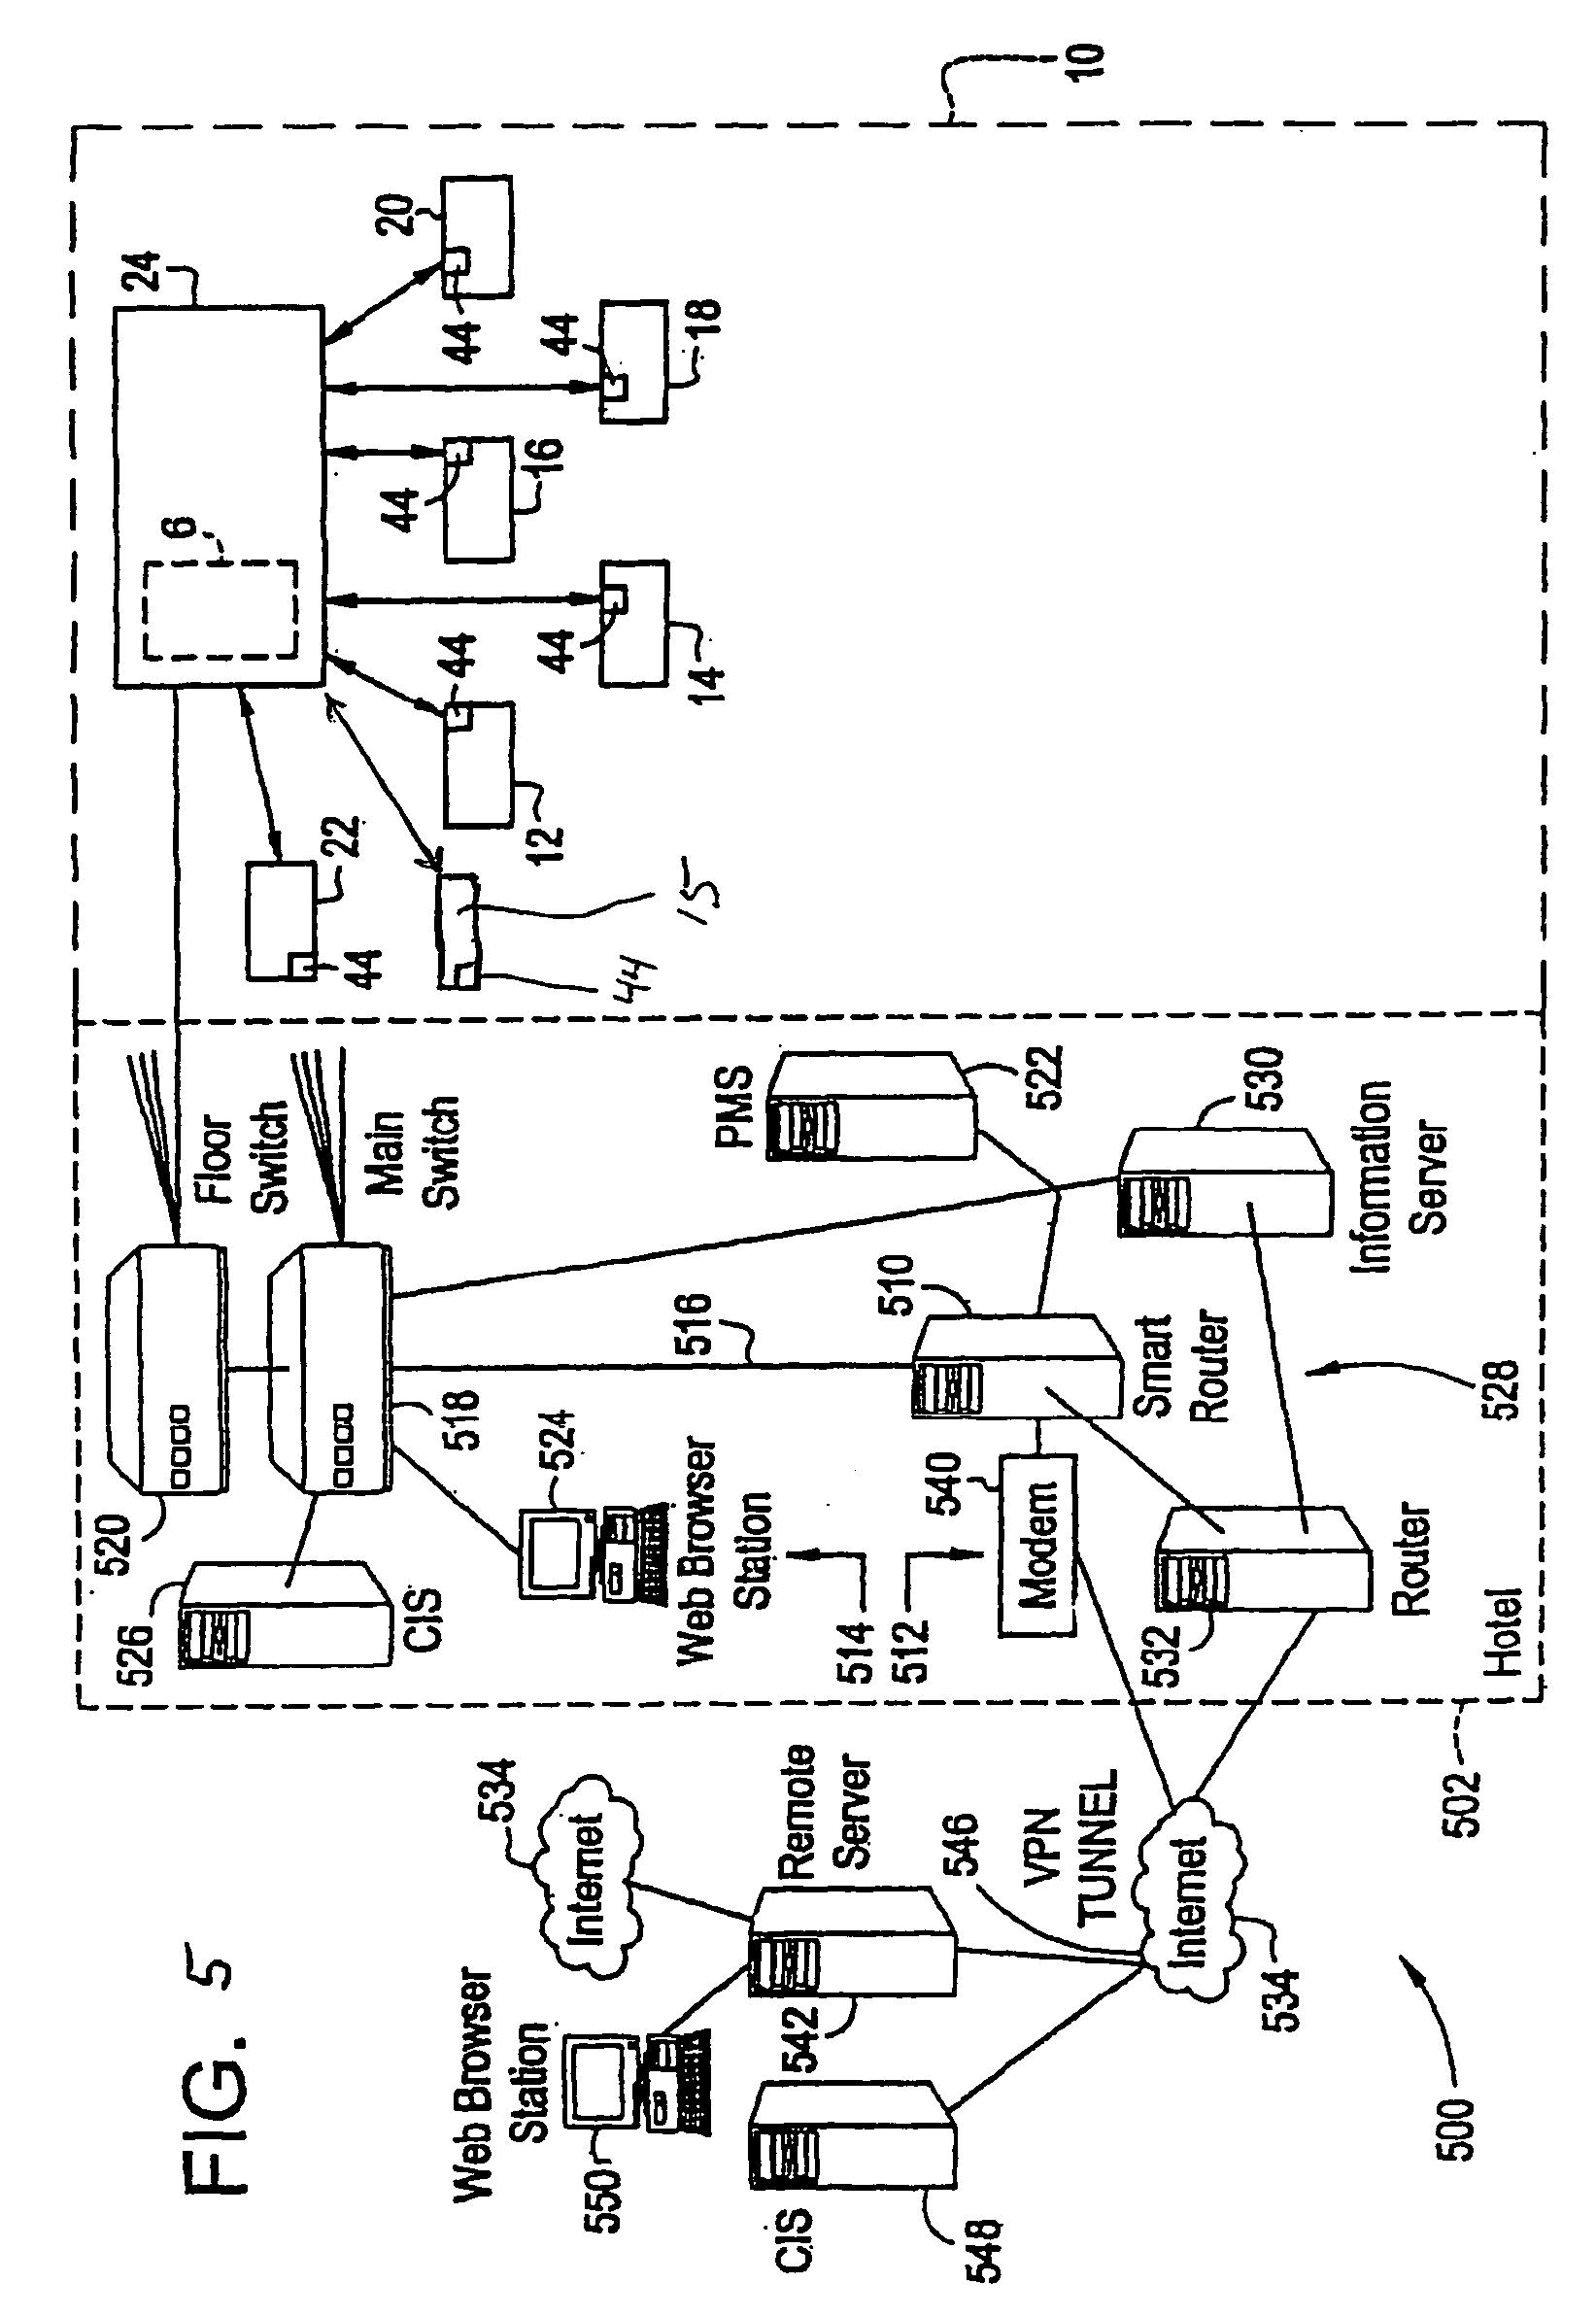 inncom e528 wiring diagram room wiring diagrams schematics inncom e4 manual 7 inncom e528 wiring diagram room wiring diagram inncom e528 thermostat wiring diagram inncom eco thermostat inncom wiring diagram wire data \\\\u2022 inncom